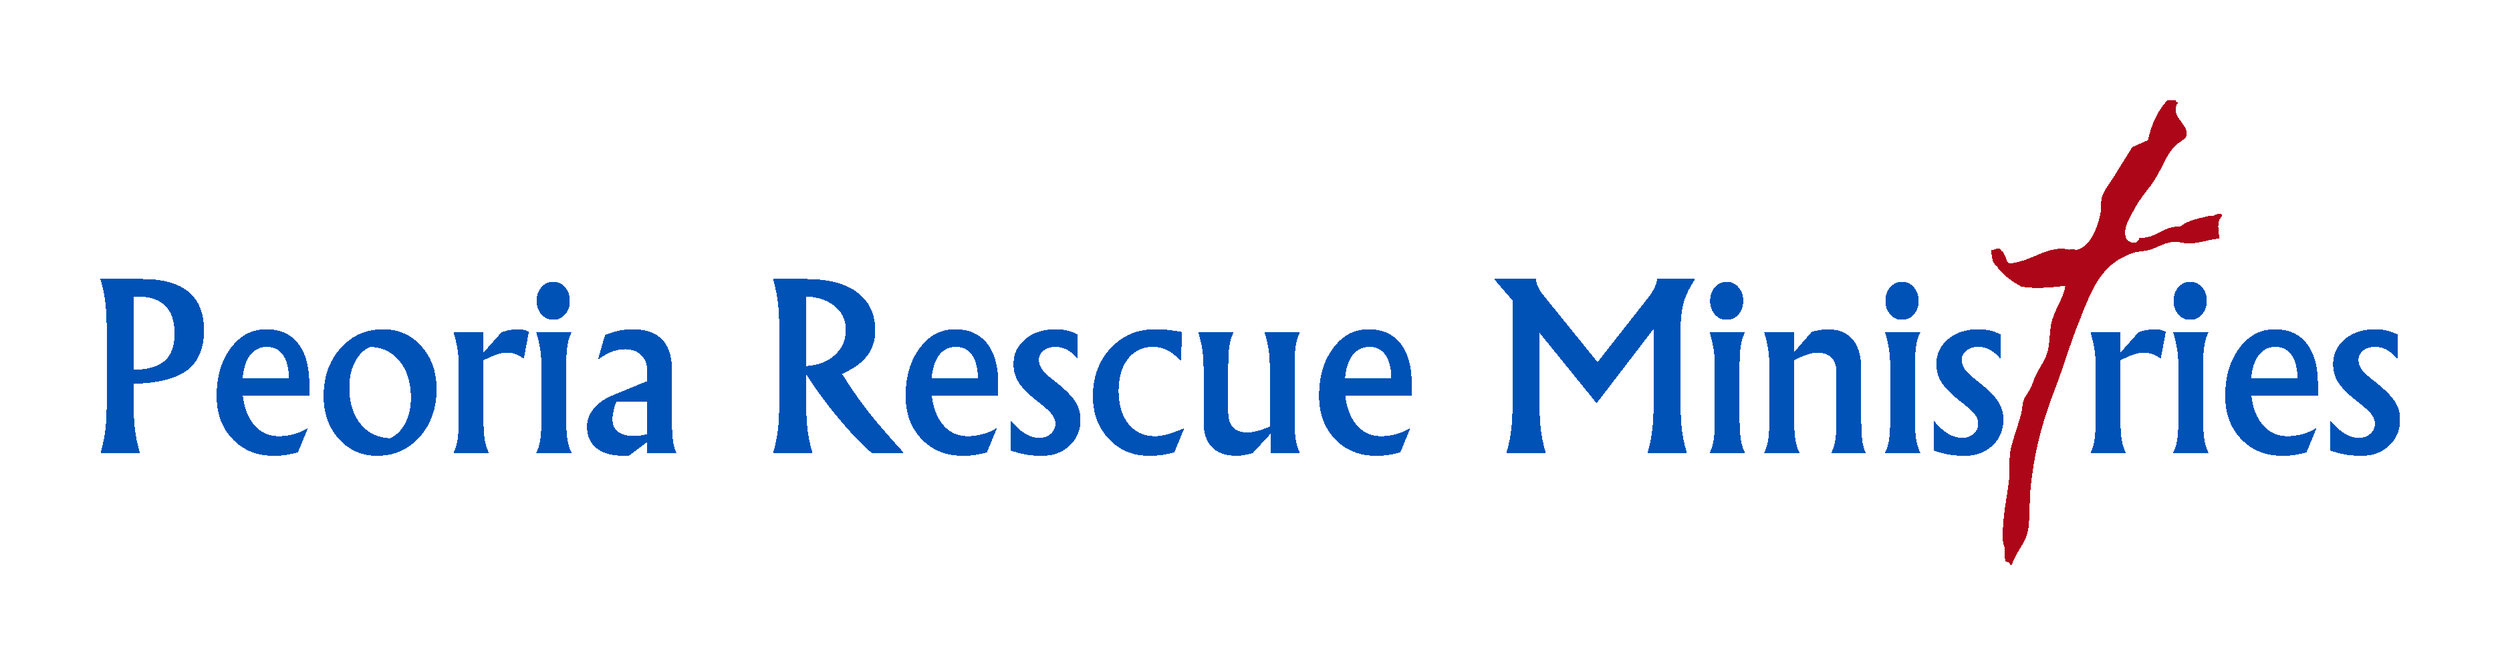 PRM logo_Current.jpg